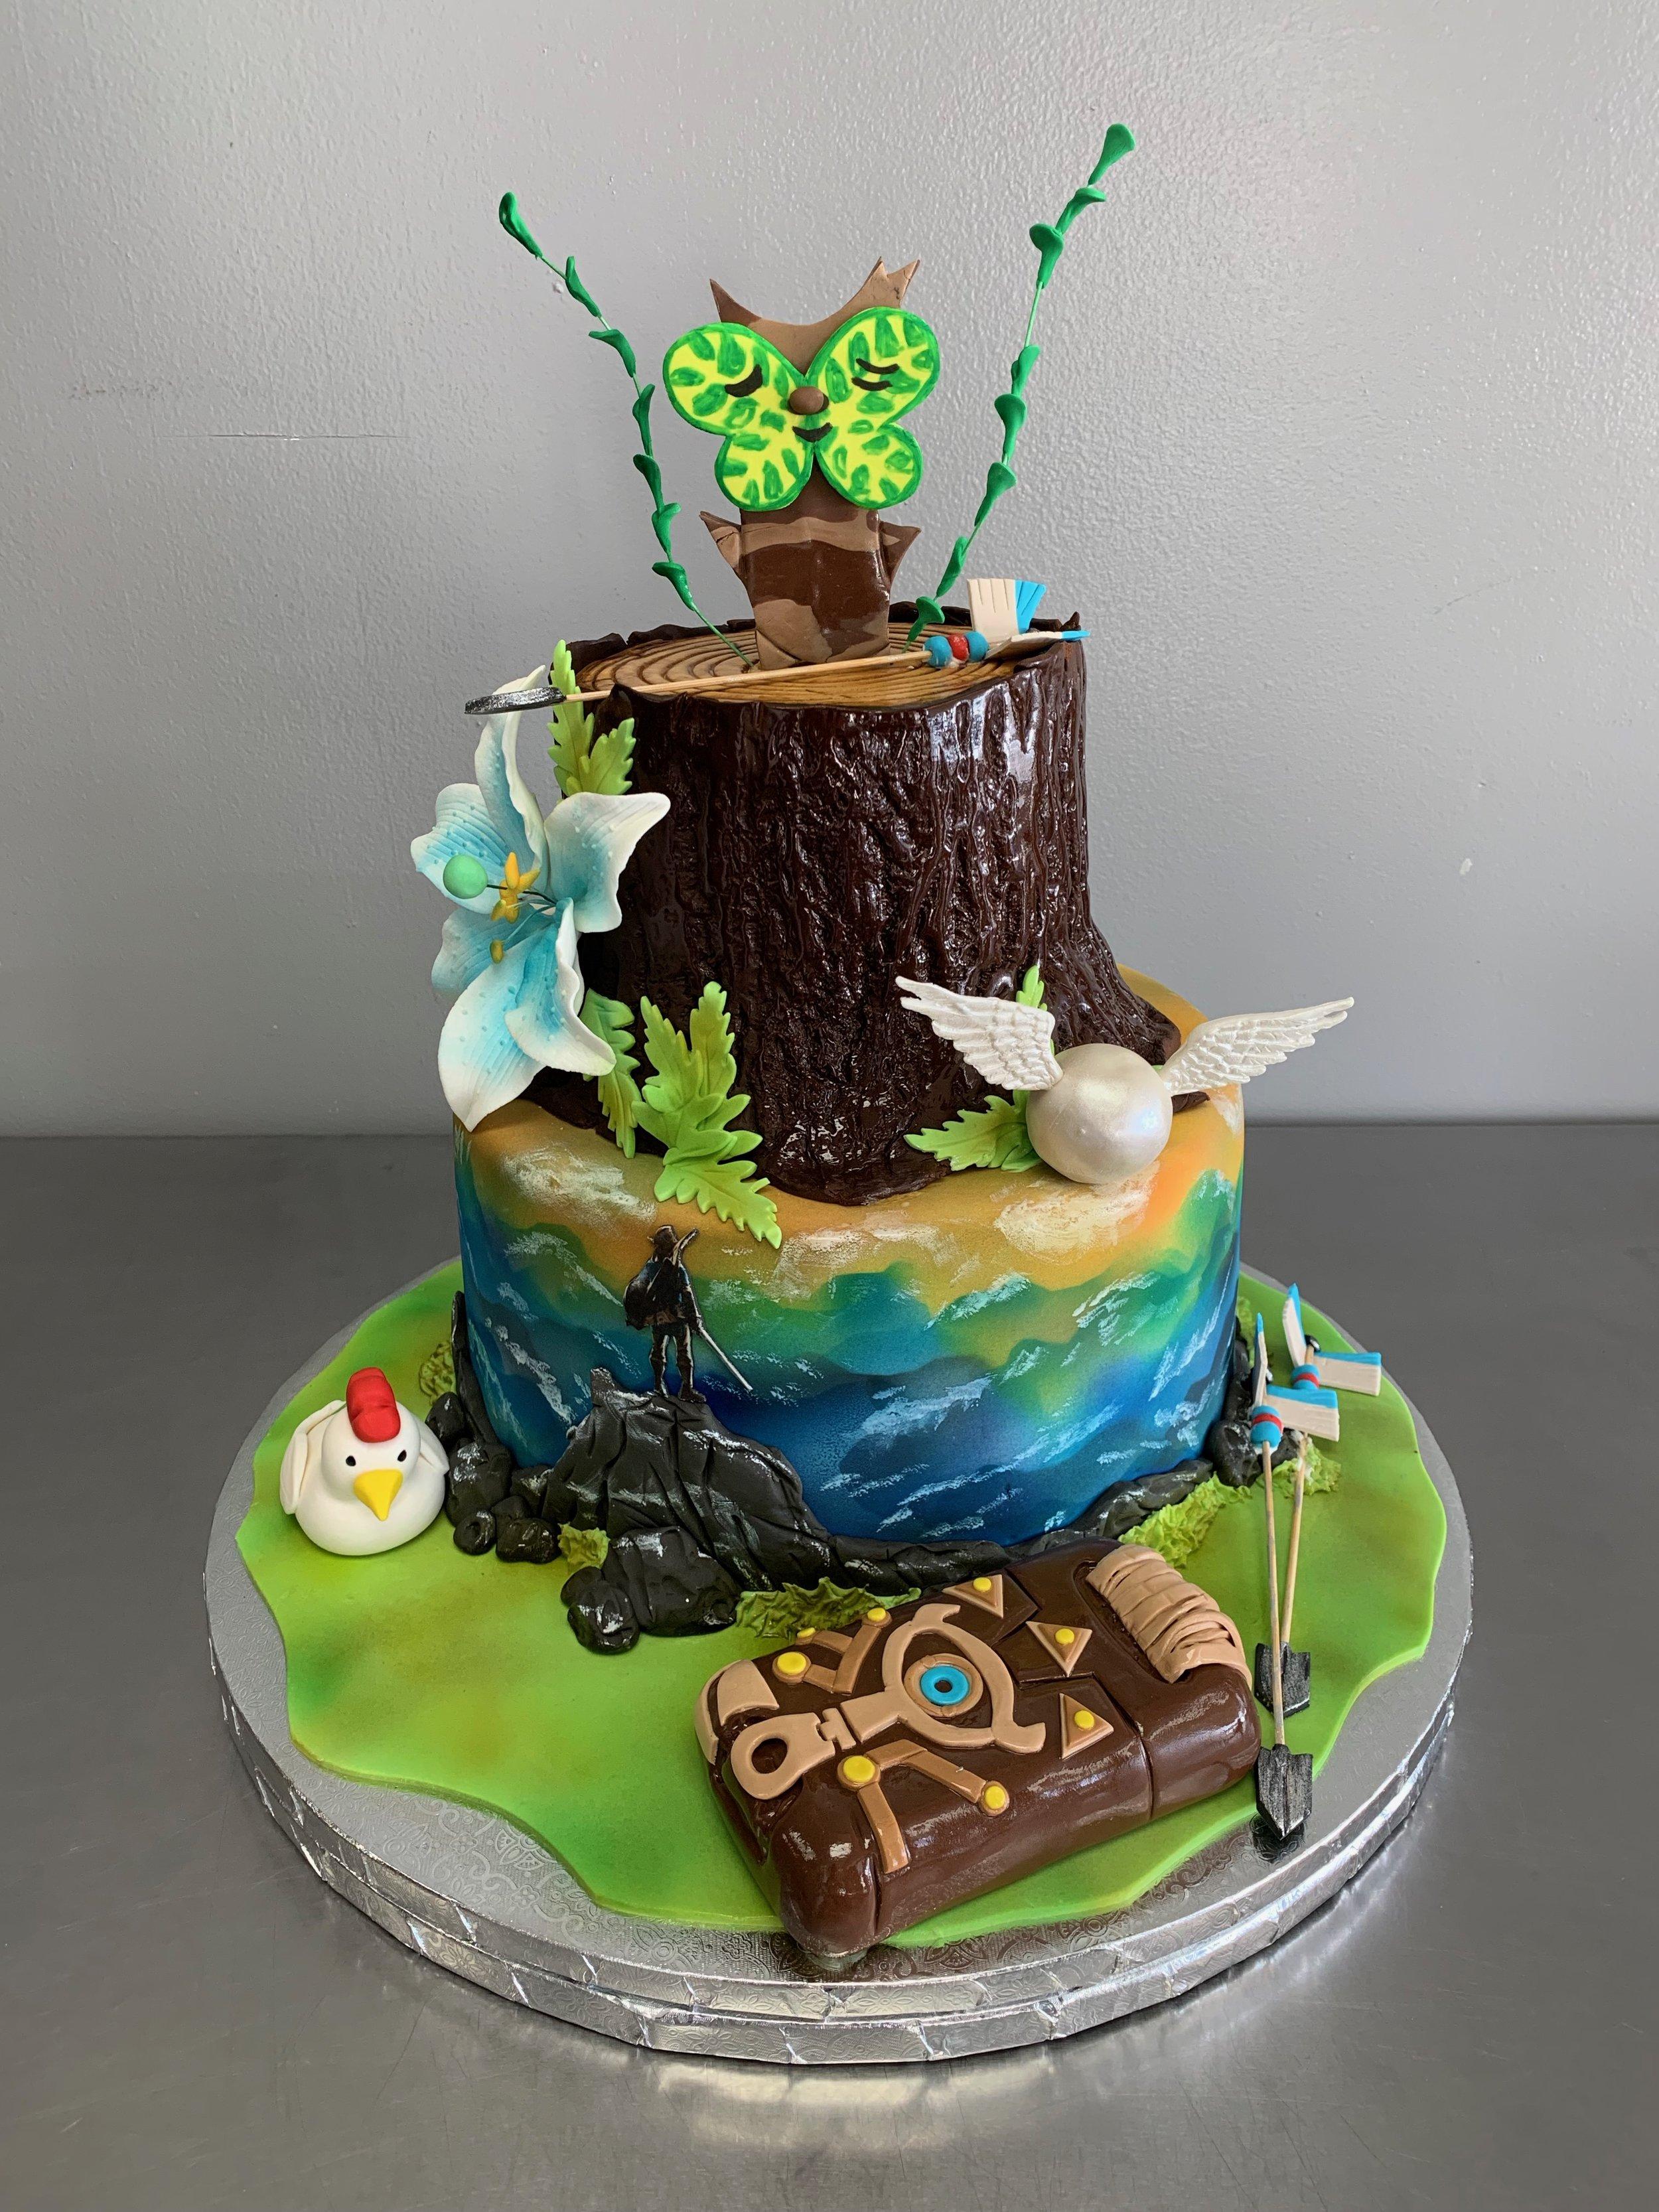 Miraculous The Legend Of Zelda Grooms Cake Skazka Desserts Bakery Nj Funny Birthday Cards Online Elaedamsfinfo